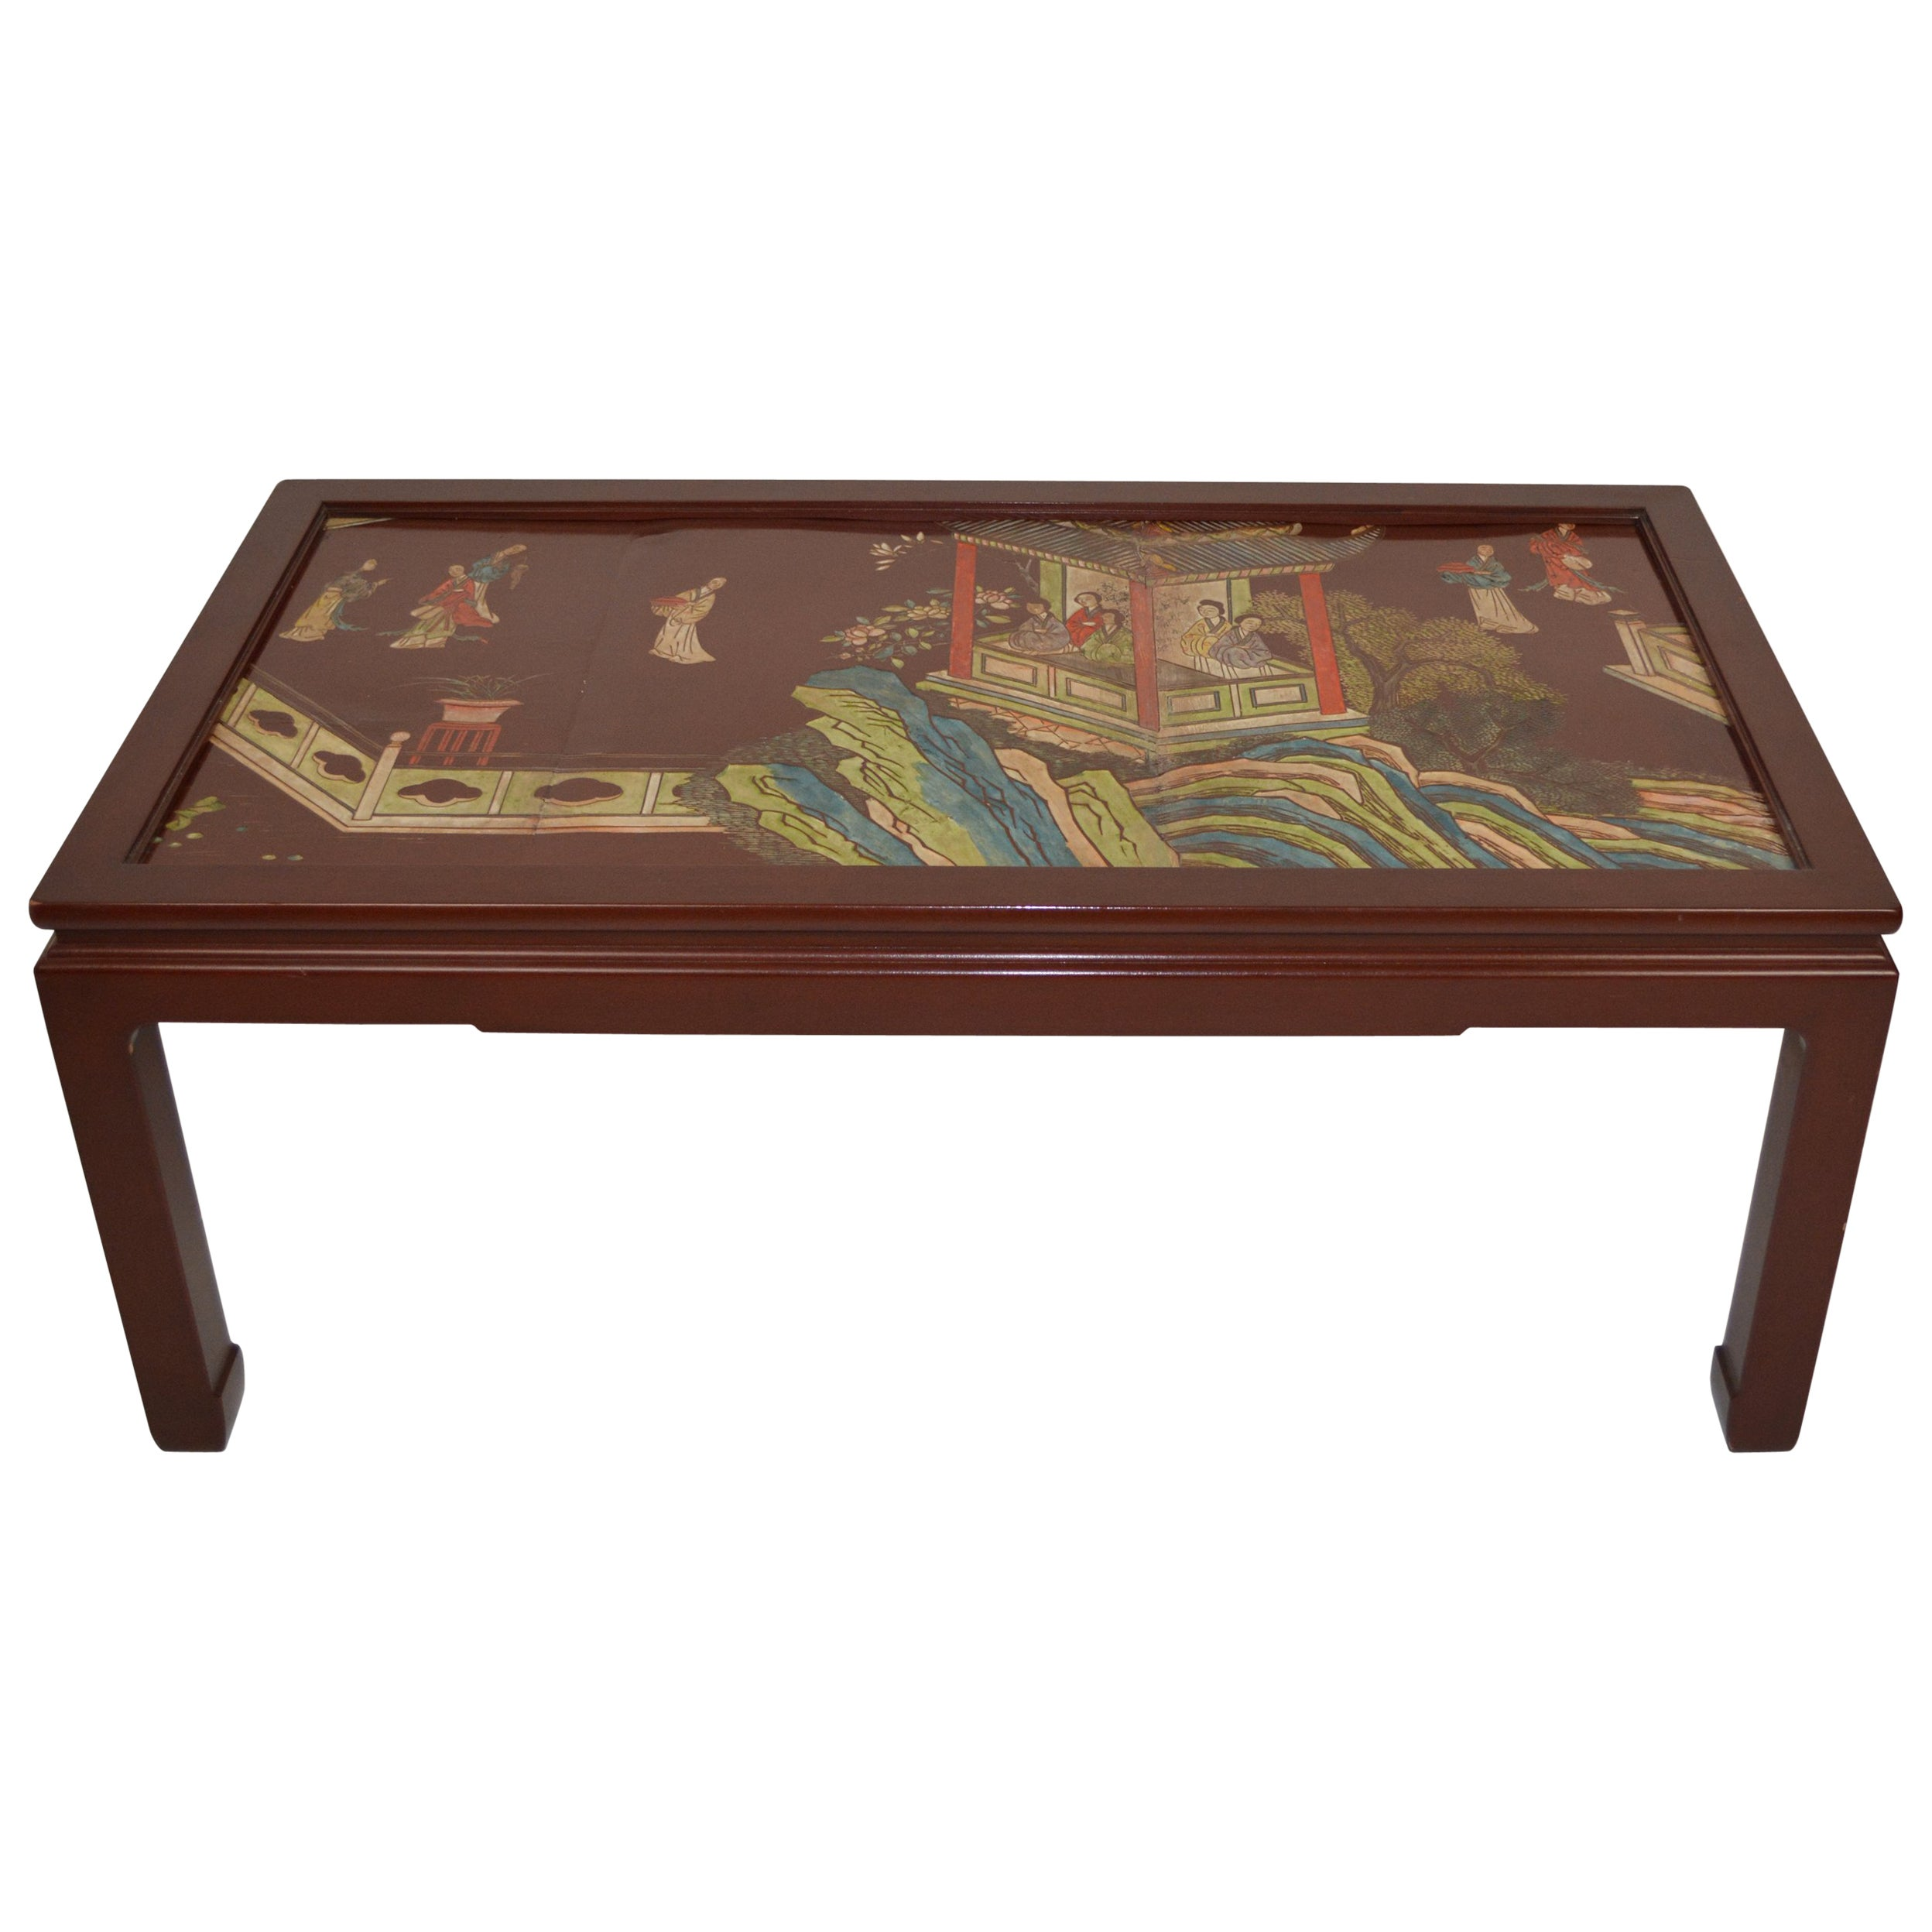 Chinese Coromandel Panel Coffee Table